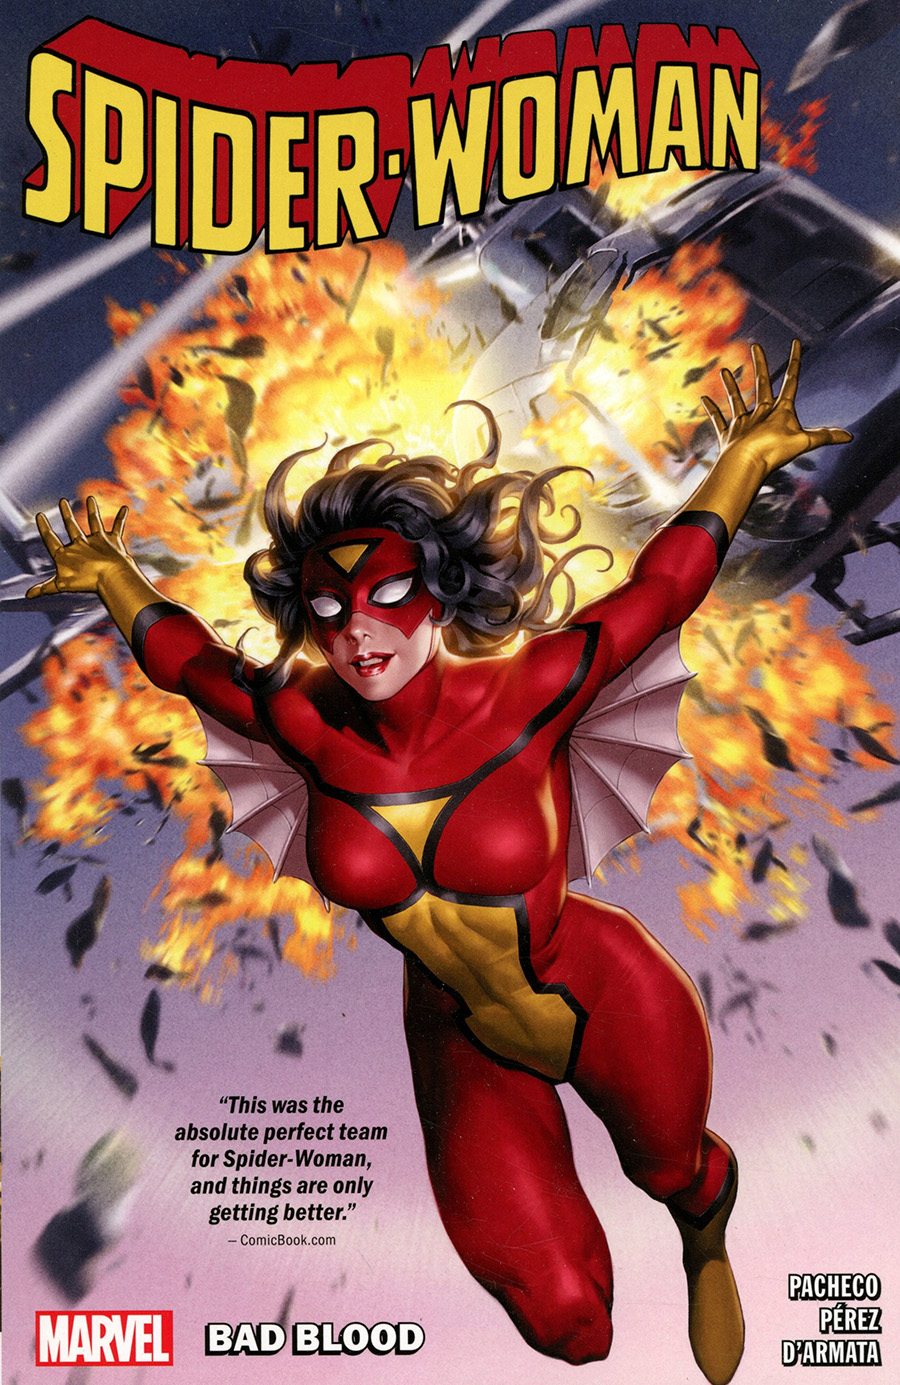 Spider-Woman (2020) Vol 1 Bad Blood TP